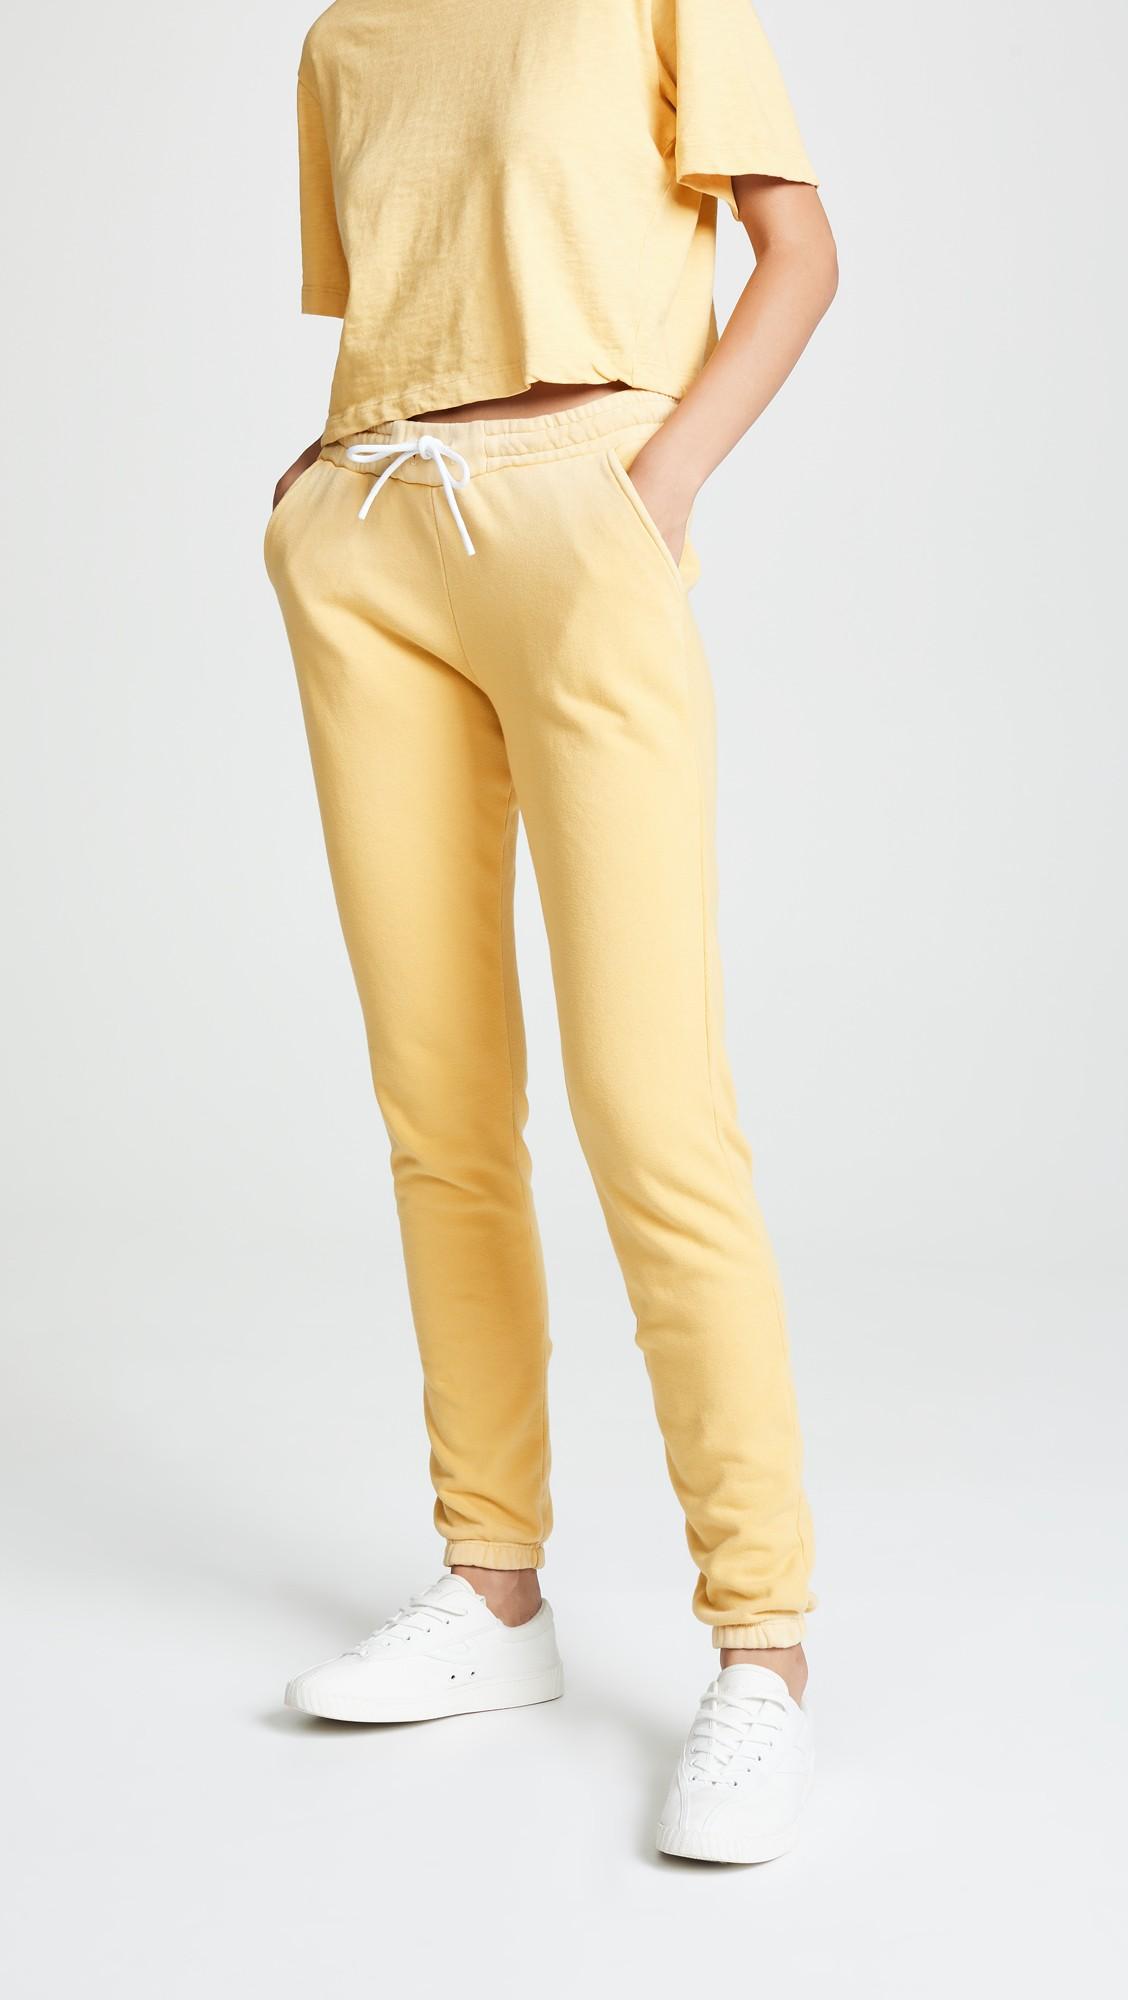 Aspen Sweatpants by Cotton Citizen, available on shopbop.com for $97.5 Hailey Baldwin Pants Exact Product